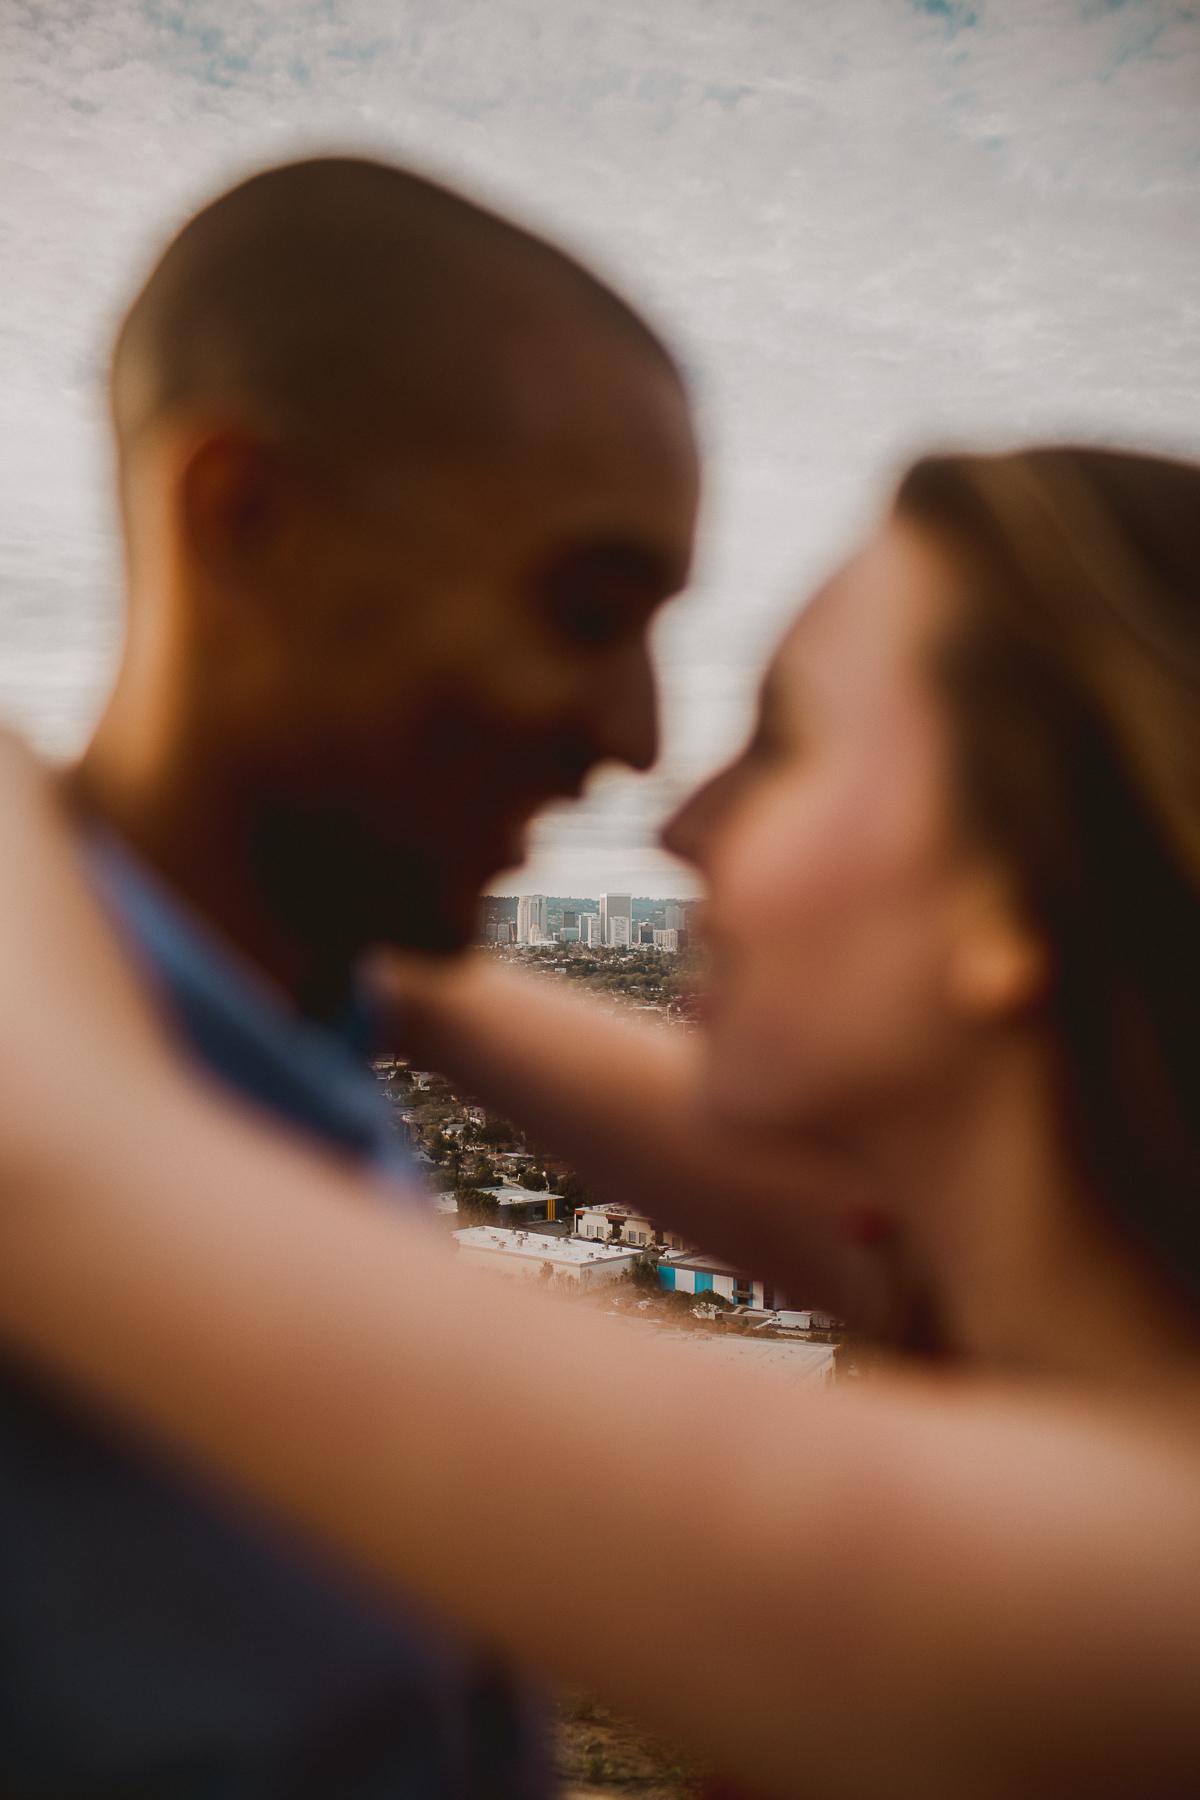 mar-vista-baldwin-hills-scenic-overlook-engagement-kelley-raye-los-angeles-wedding-photographer-167.jpg